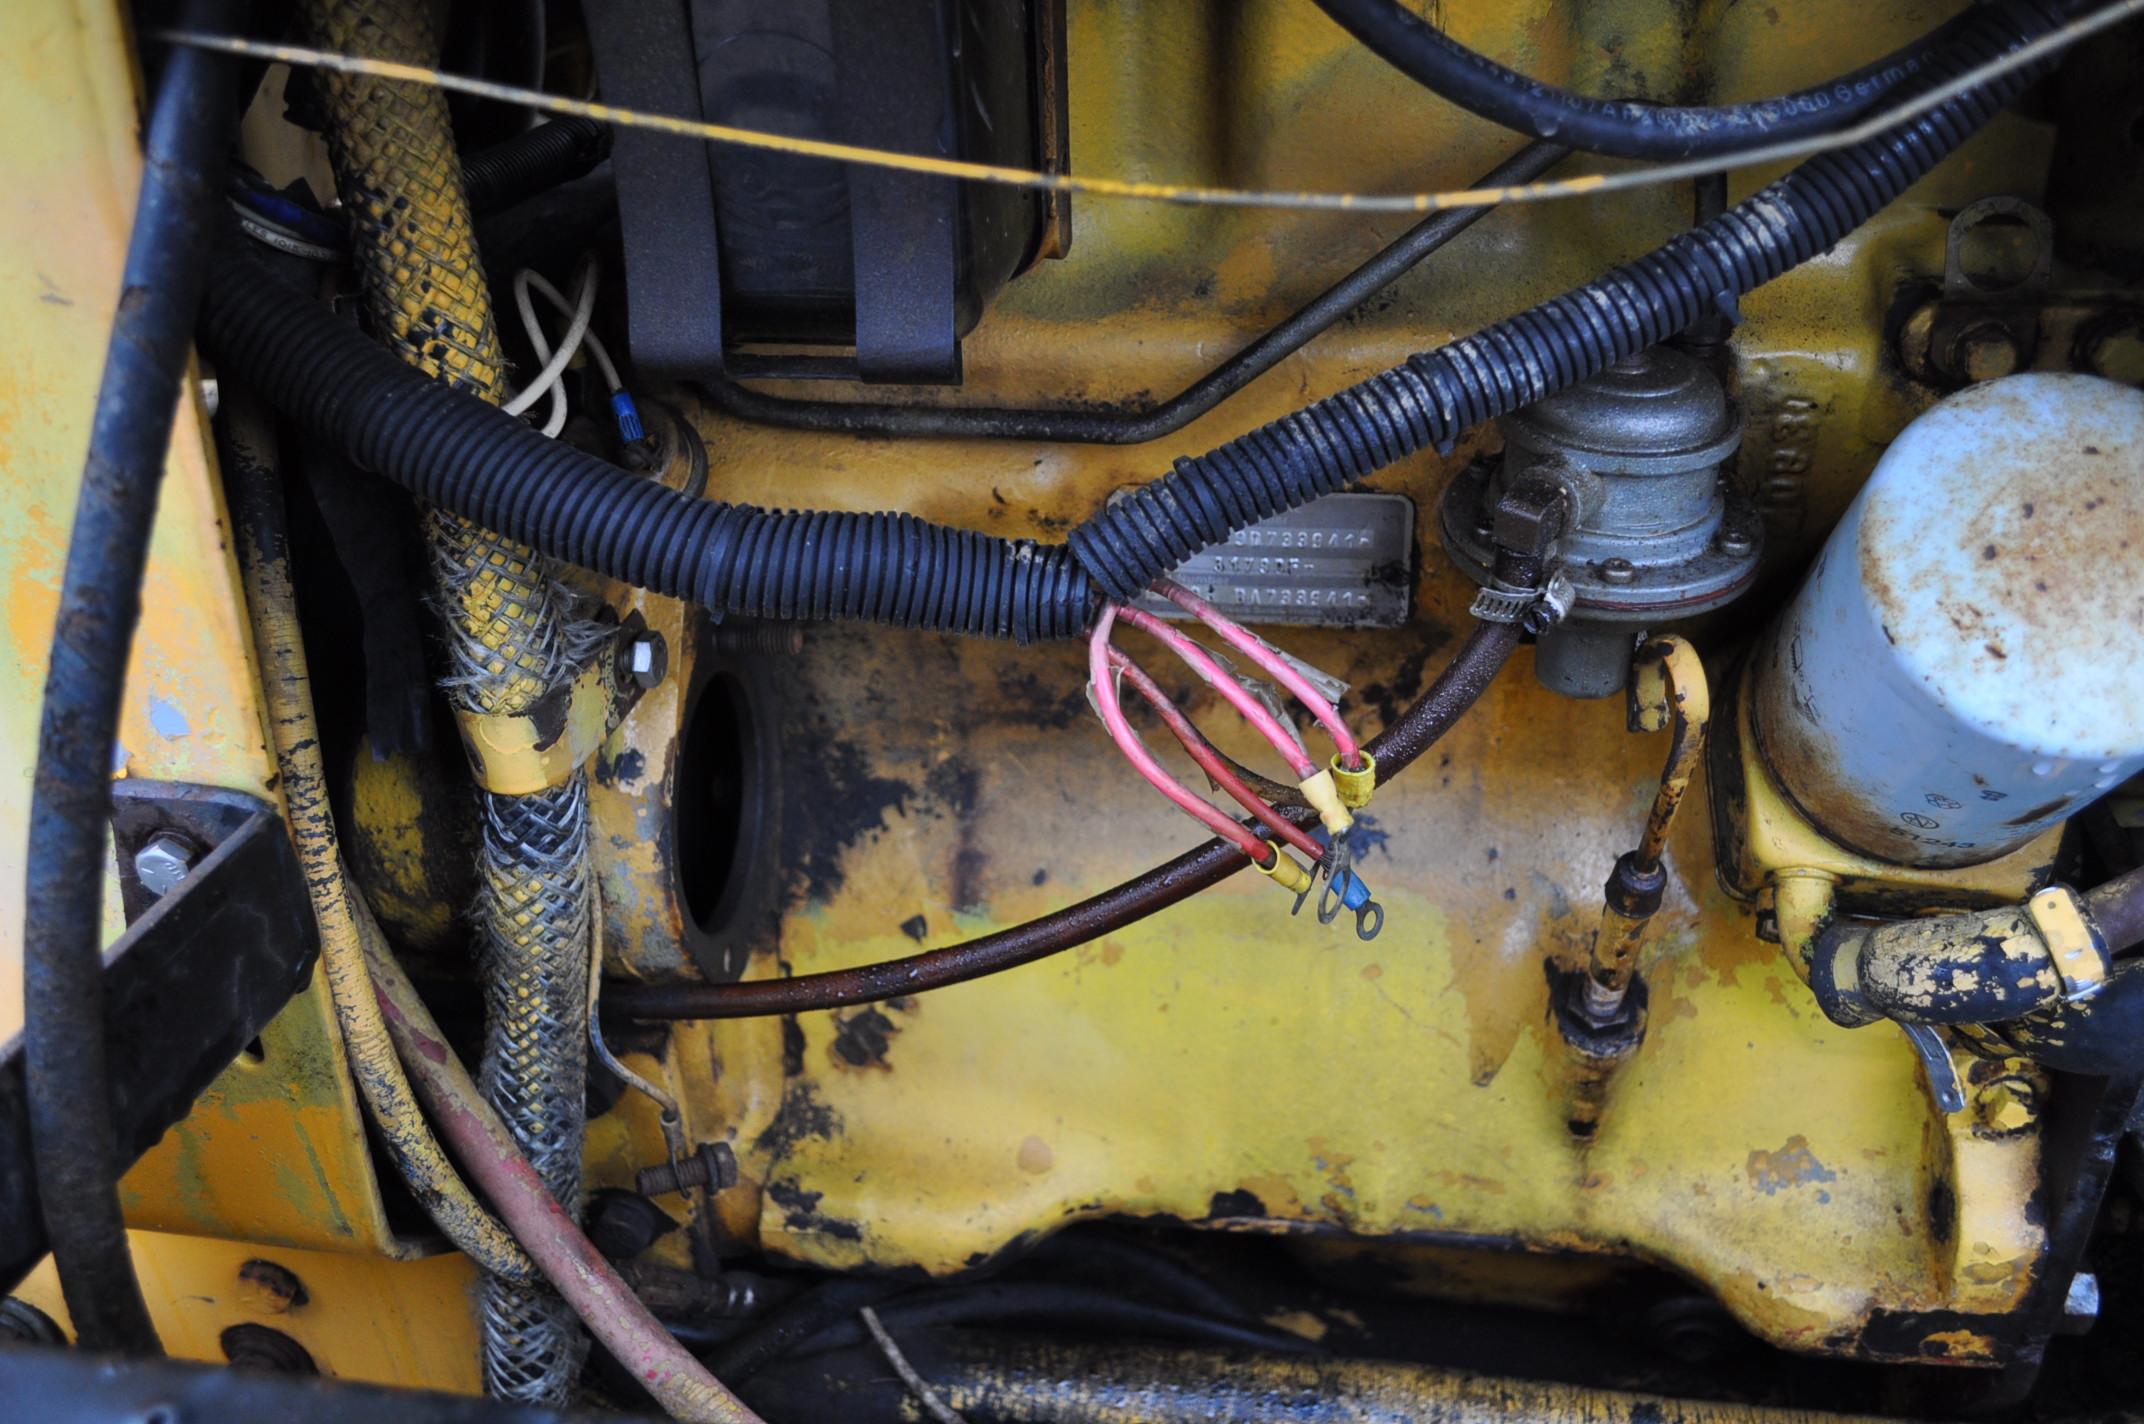 Vermeer V450 Trencher, parts machine, backhoe attachment, JD diesel, SN 1VRF082L2H1000460 - Image 13 of 15